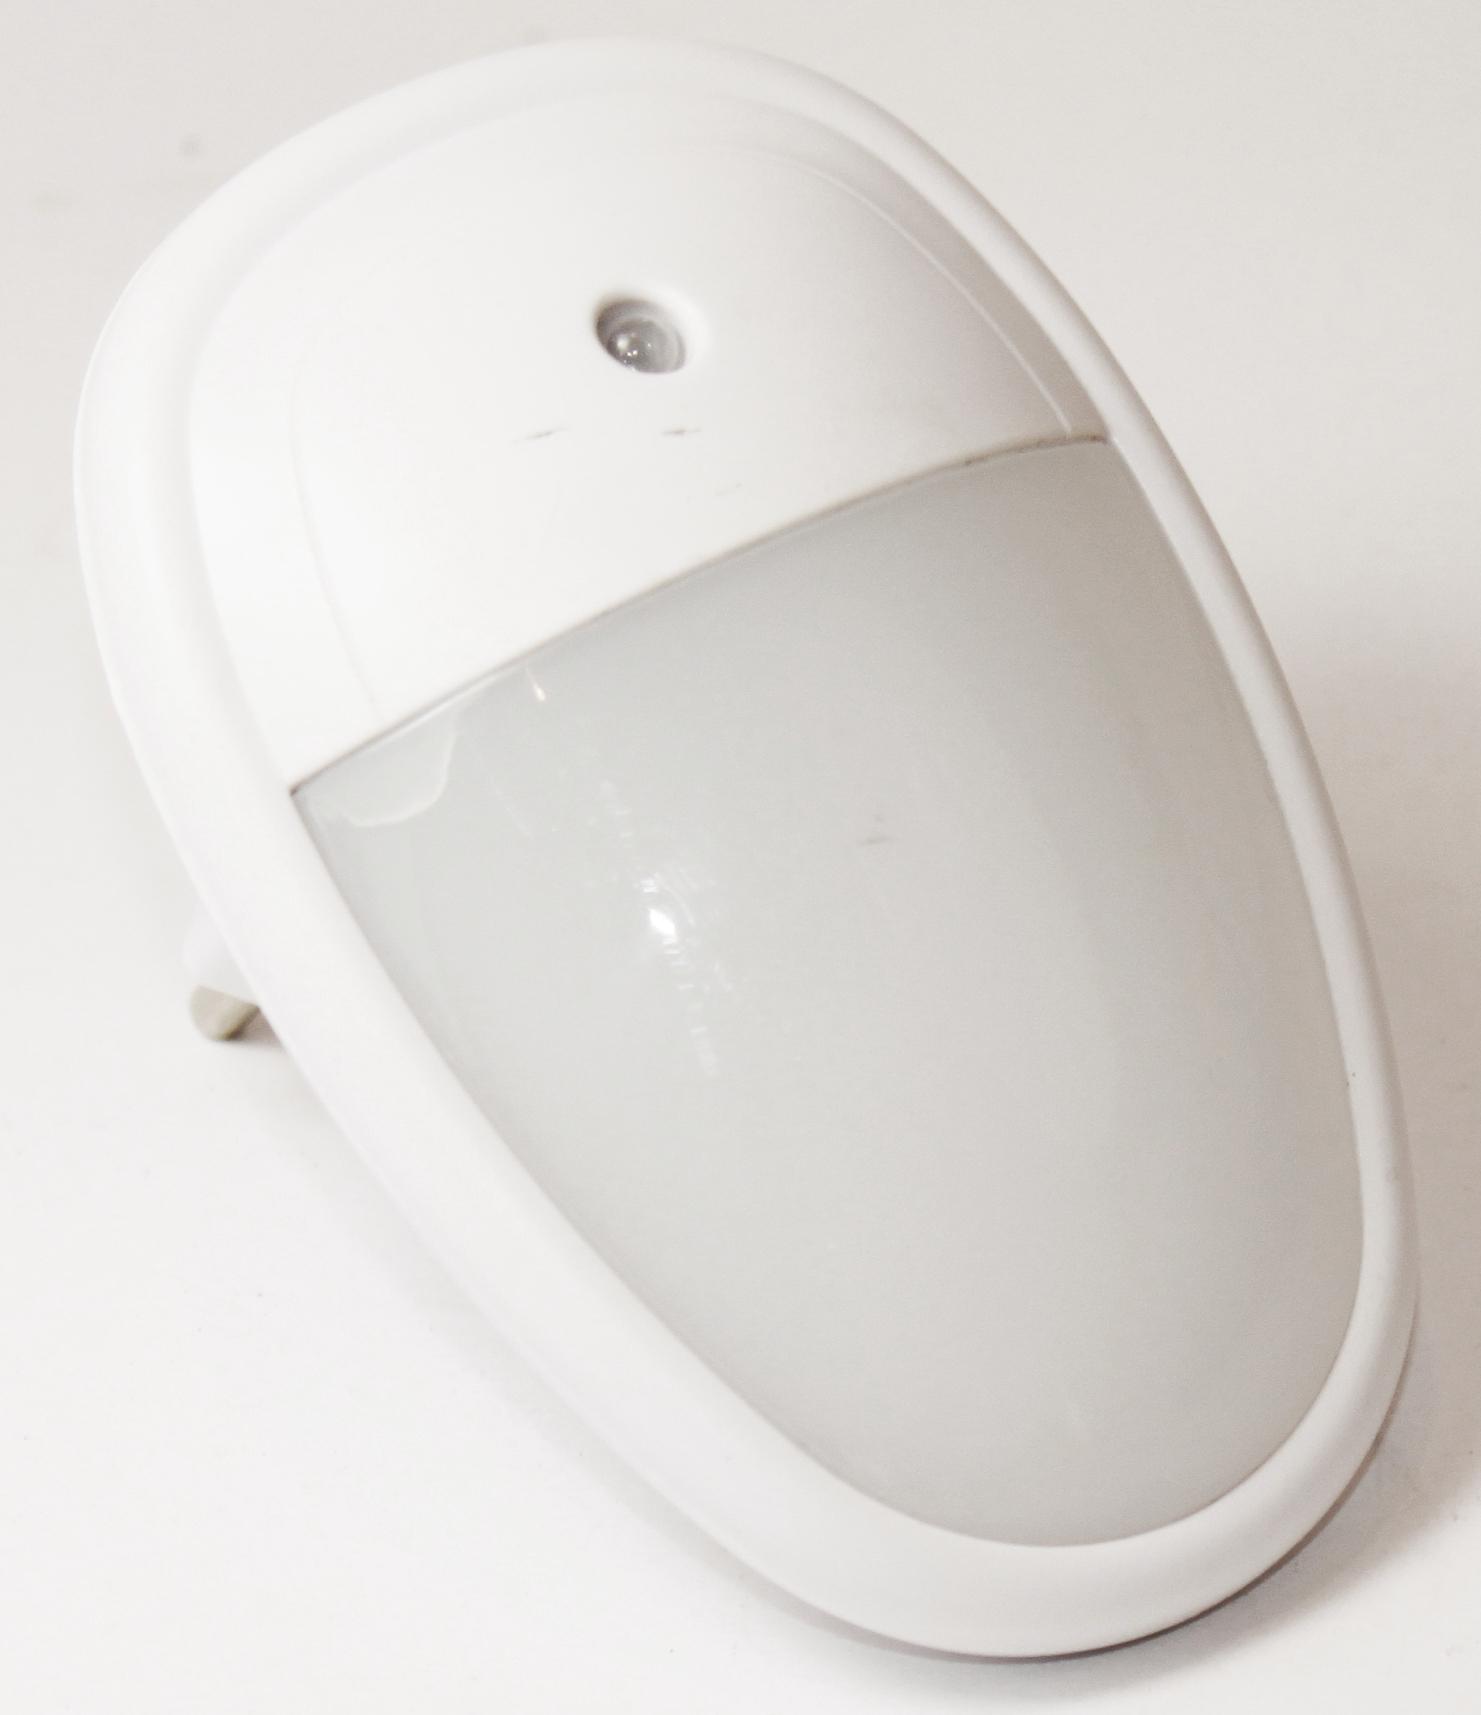 k b haushaltswaren led nachtlicht notlicht mit sensor nachtbeleuchtung lampe 230v steckdose 080. Black Bedroom Furniture Sets. Home Design Ideas